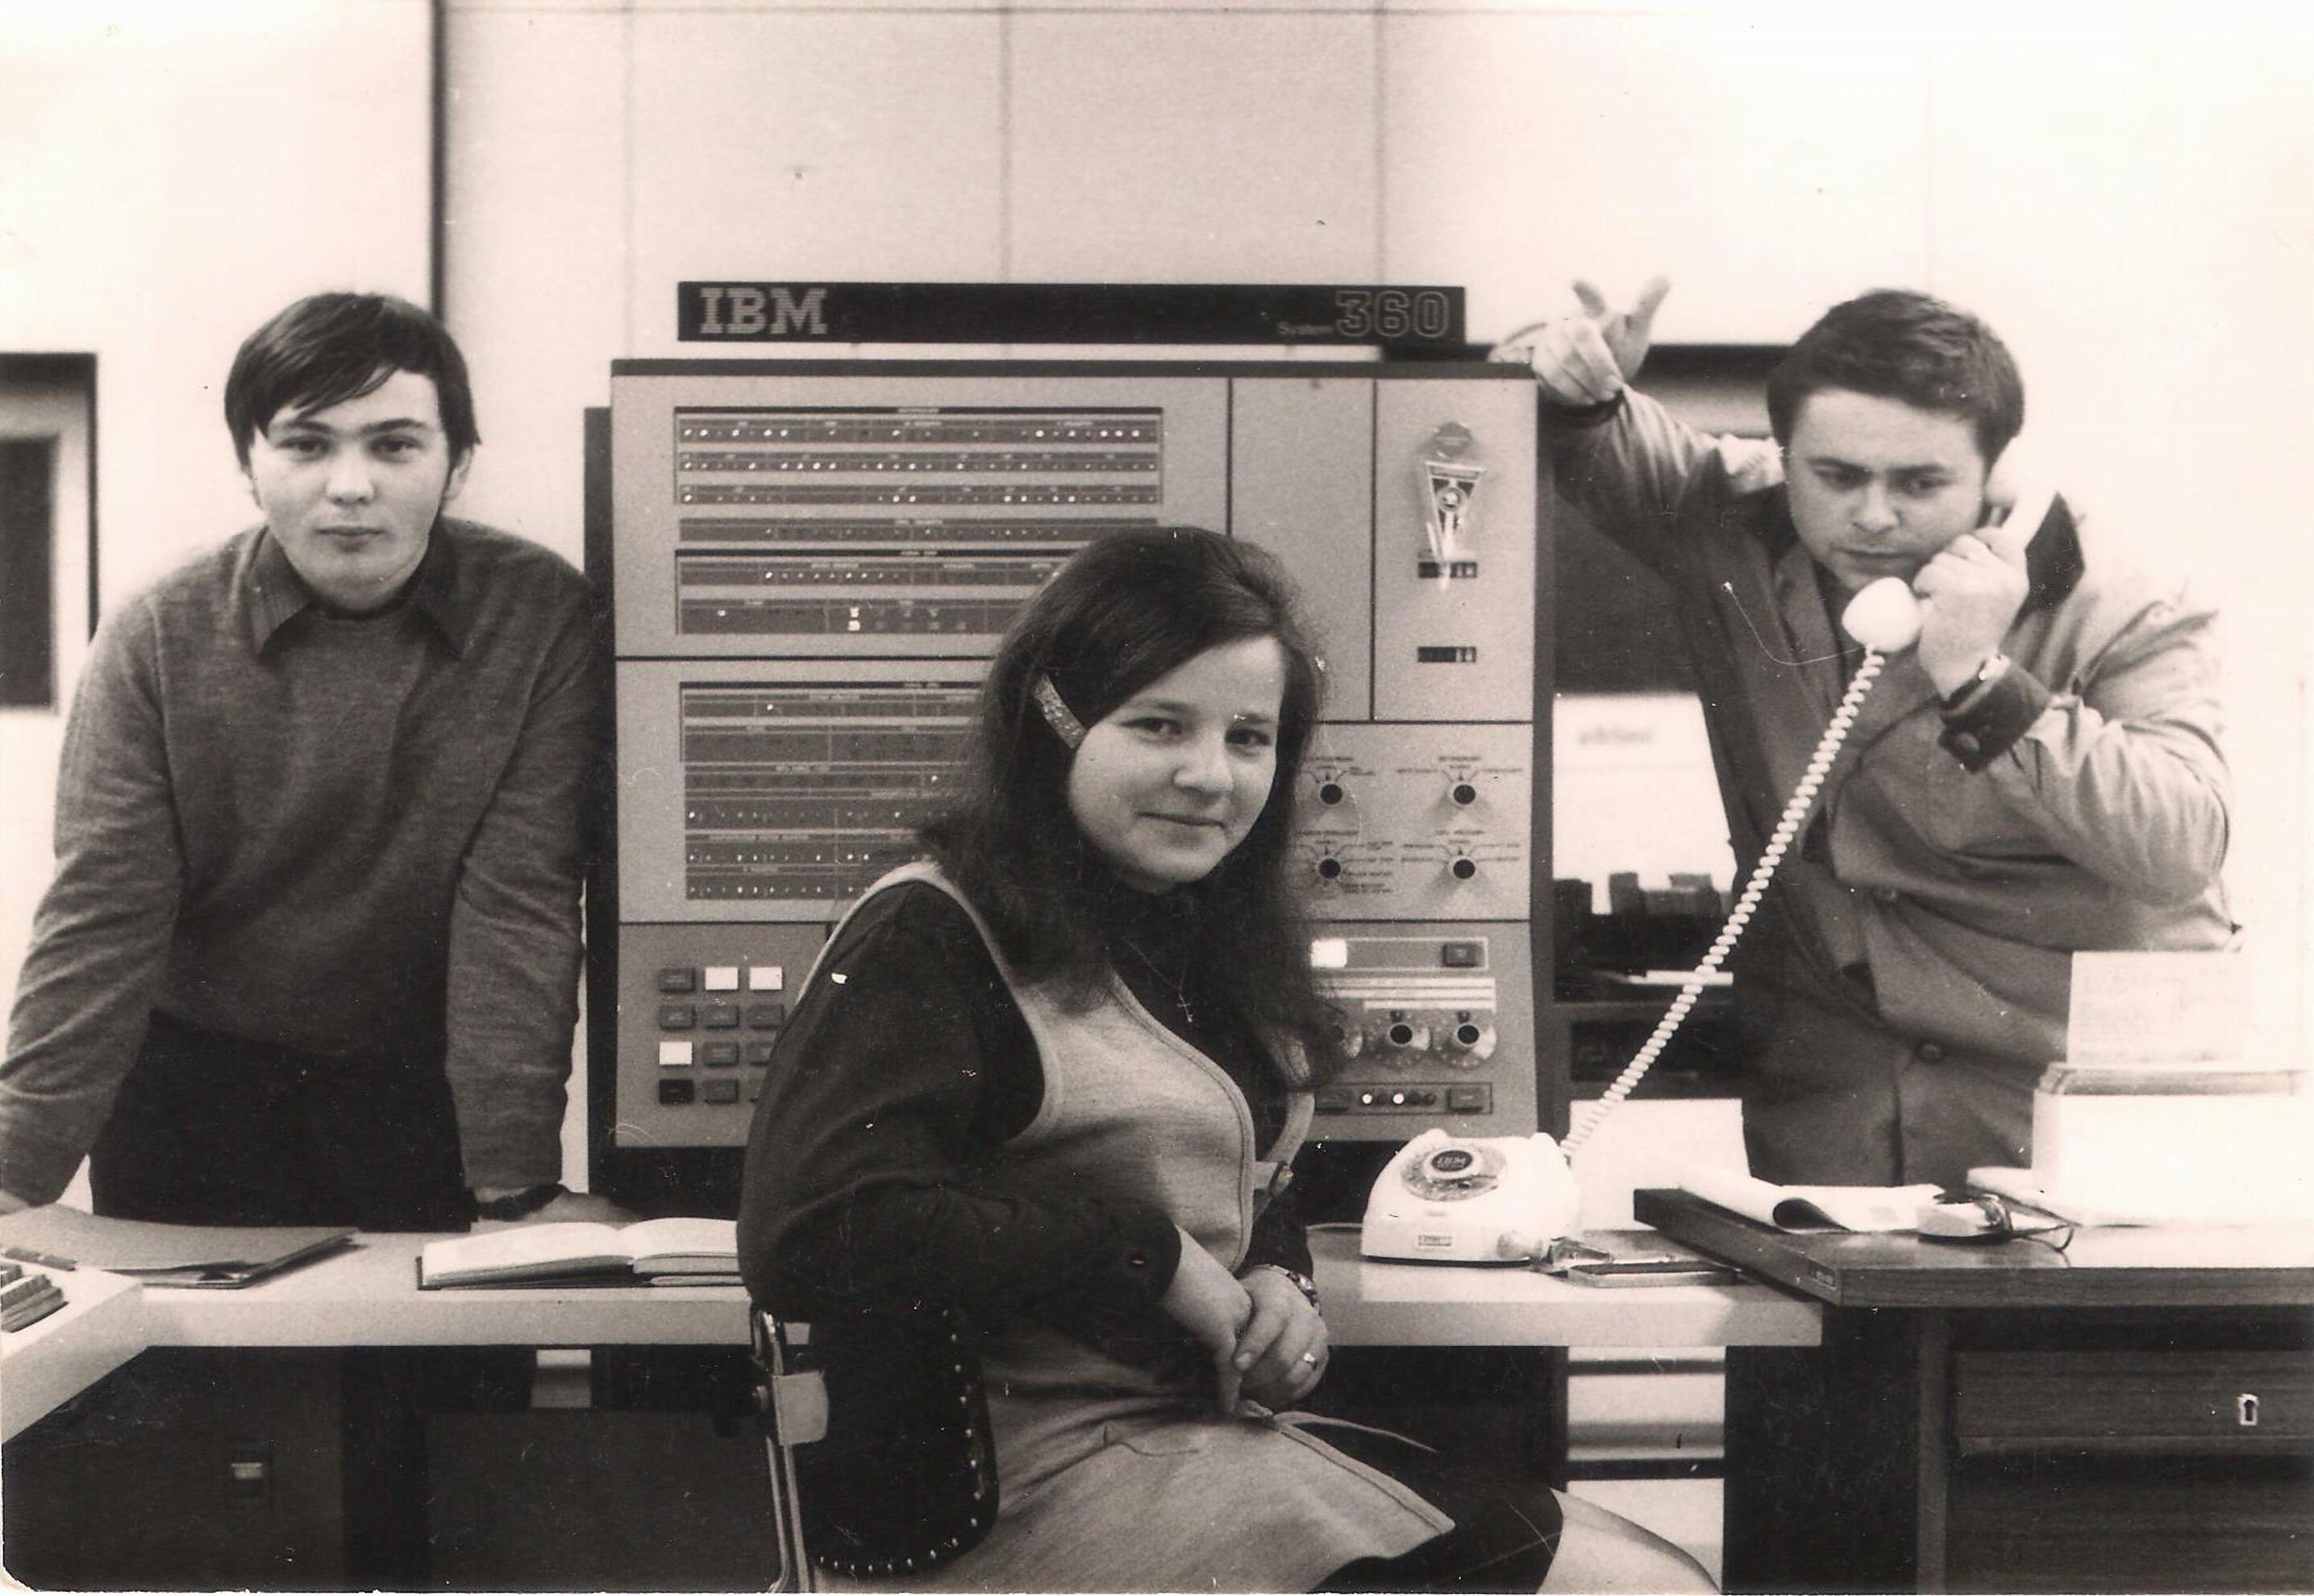 skoda-ibm-aznp-old-computer-data-centre